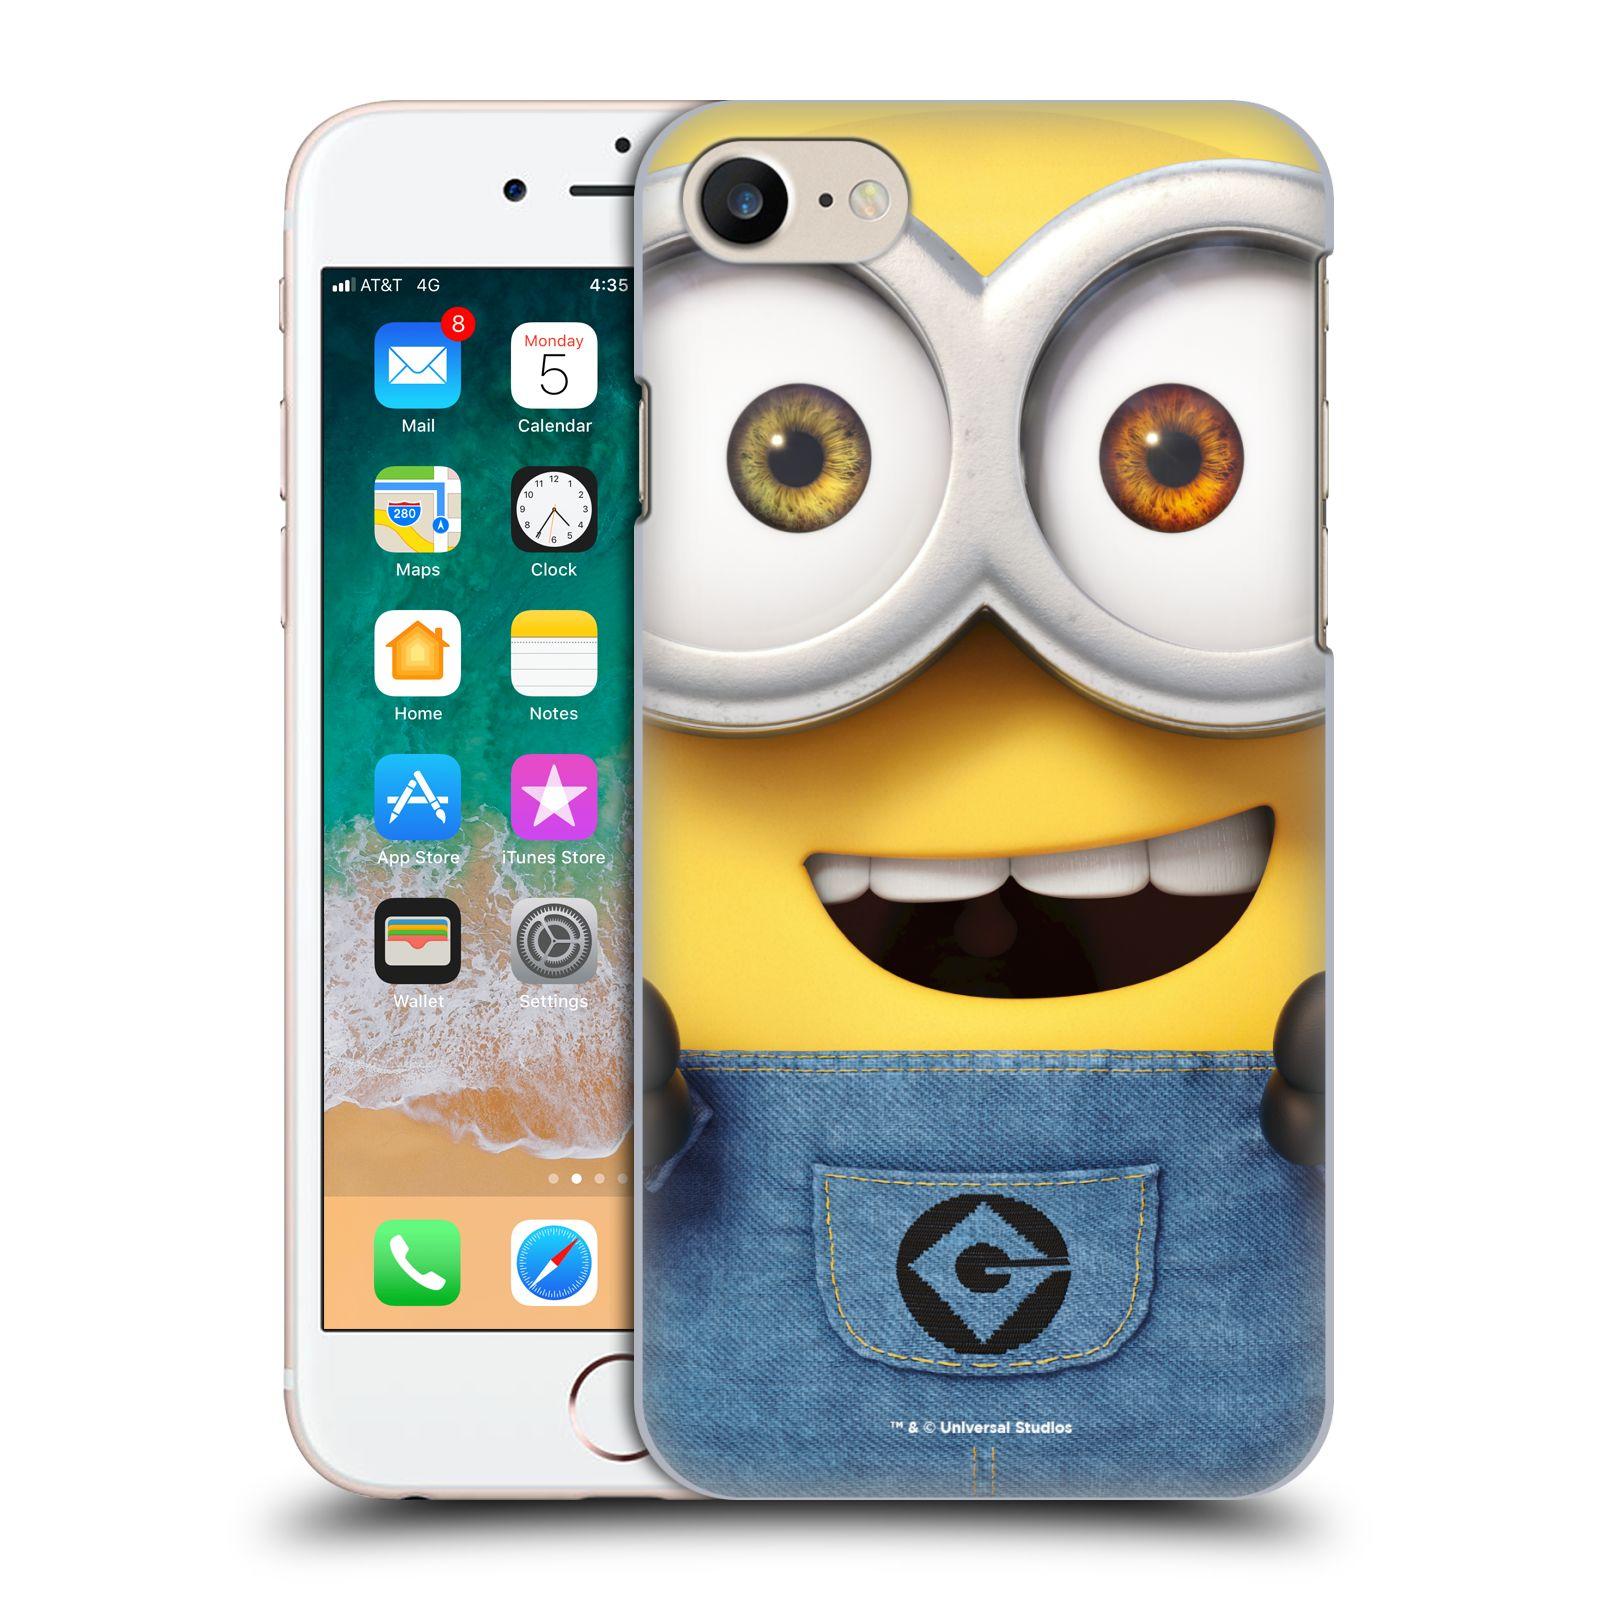 Plastové pouzdro na mobil Apple iPhone SE (2020) - Head Case - Mimoň Bob z filmu Já, padouch - Despicable Me